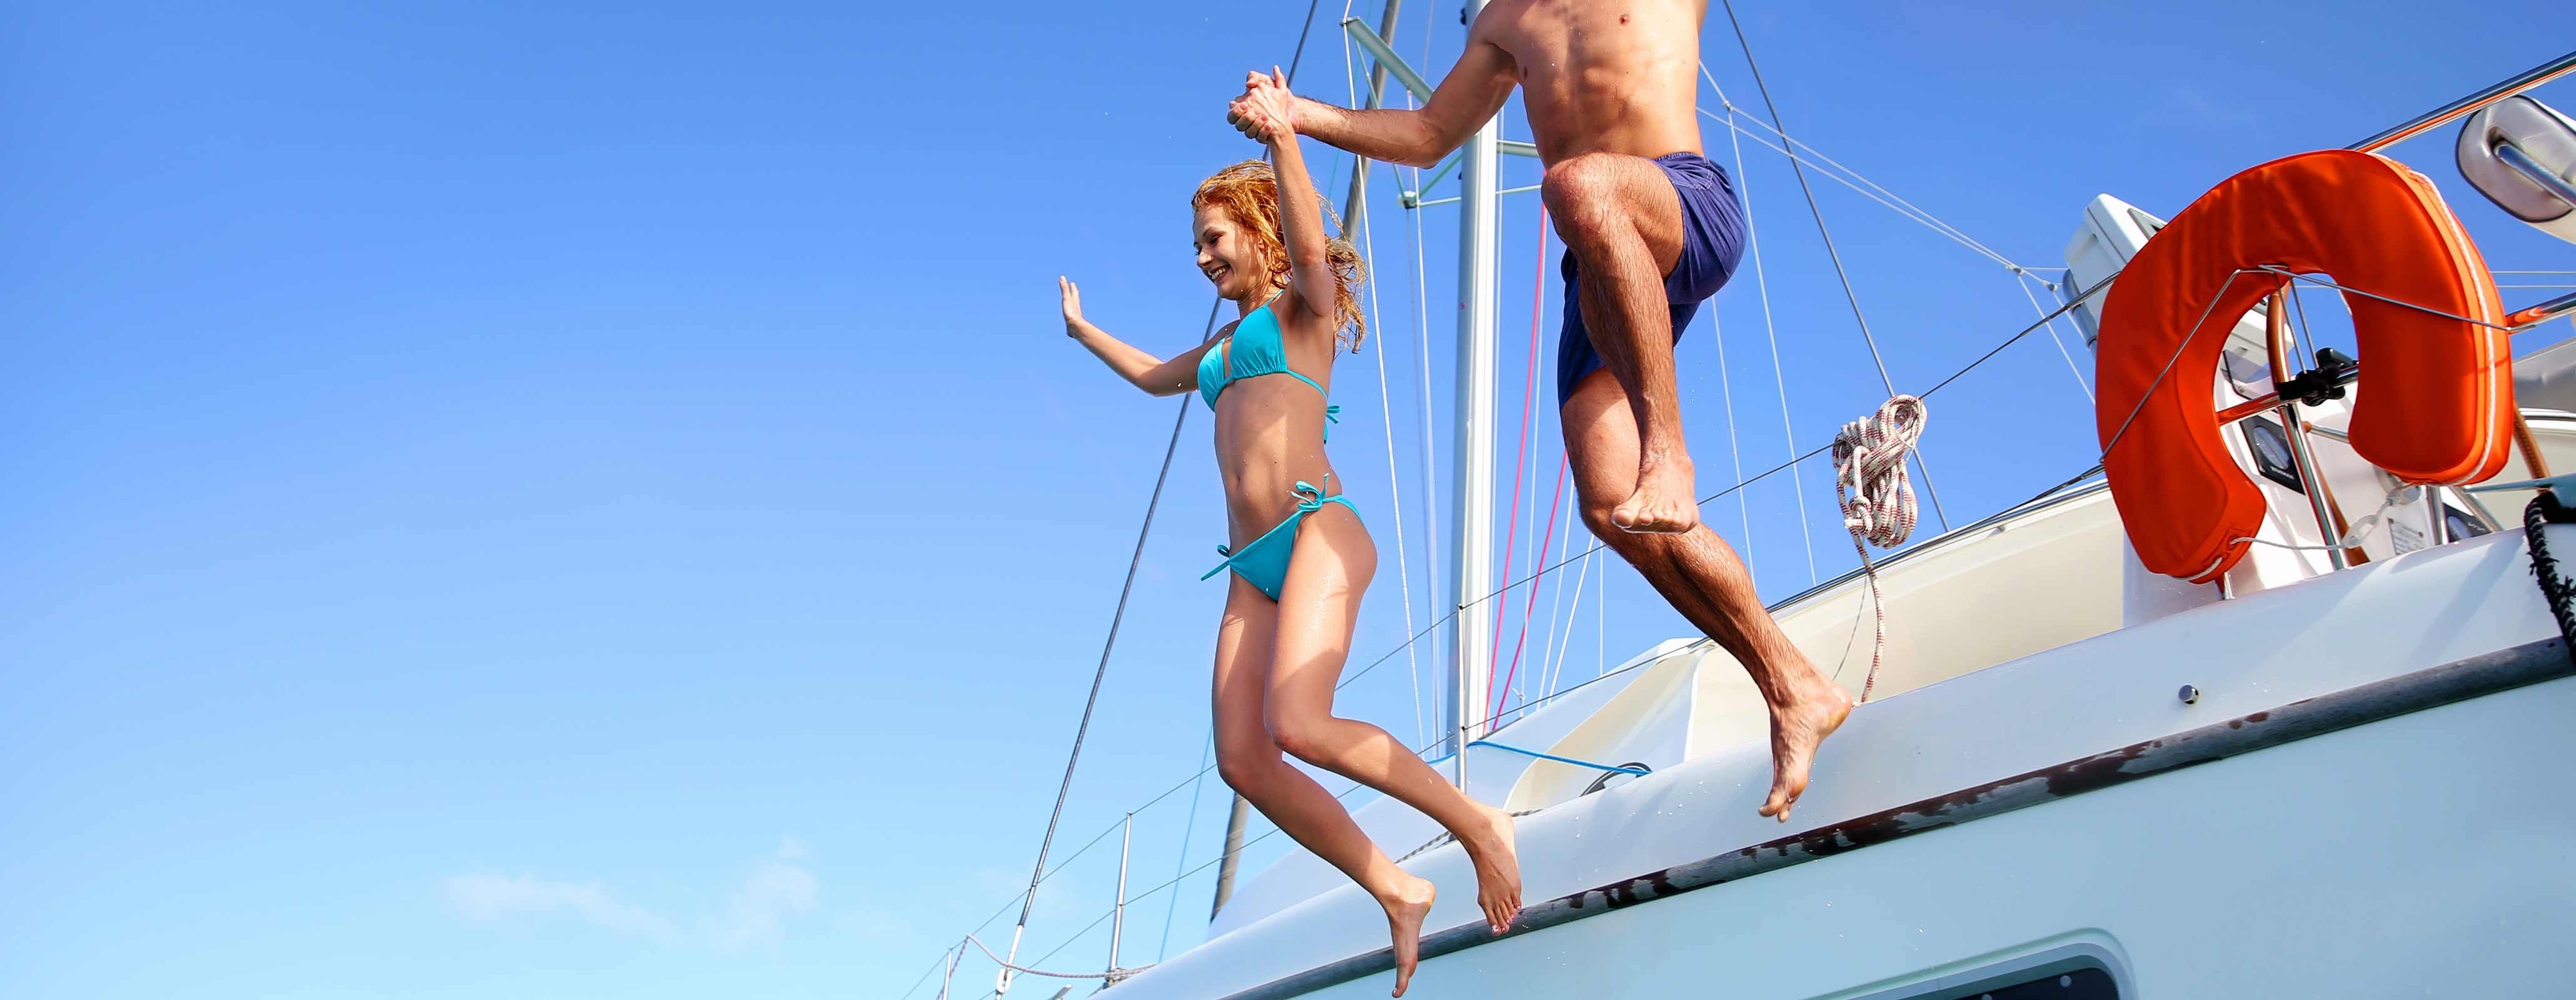 Kinderen springen van boot af